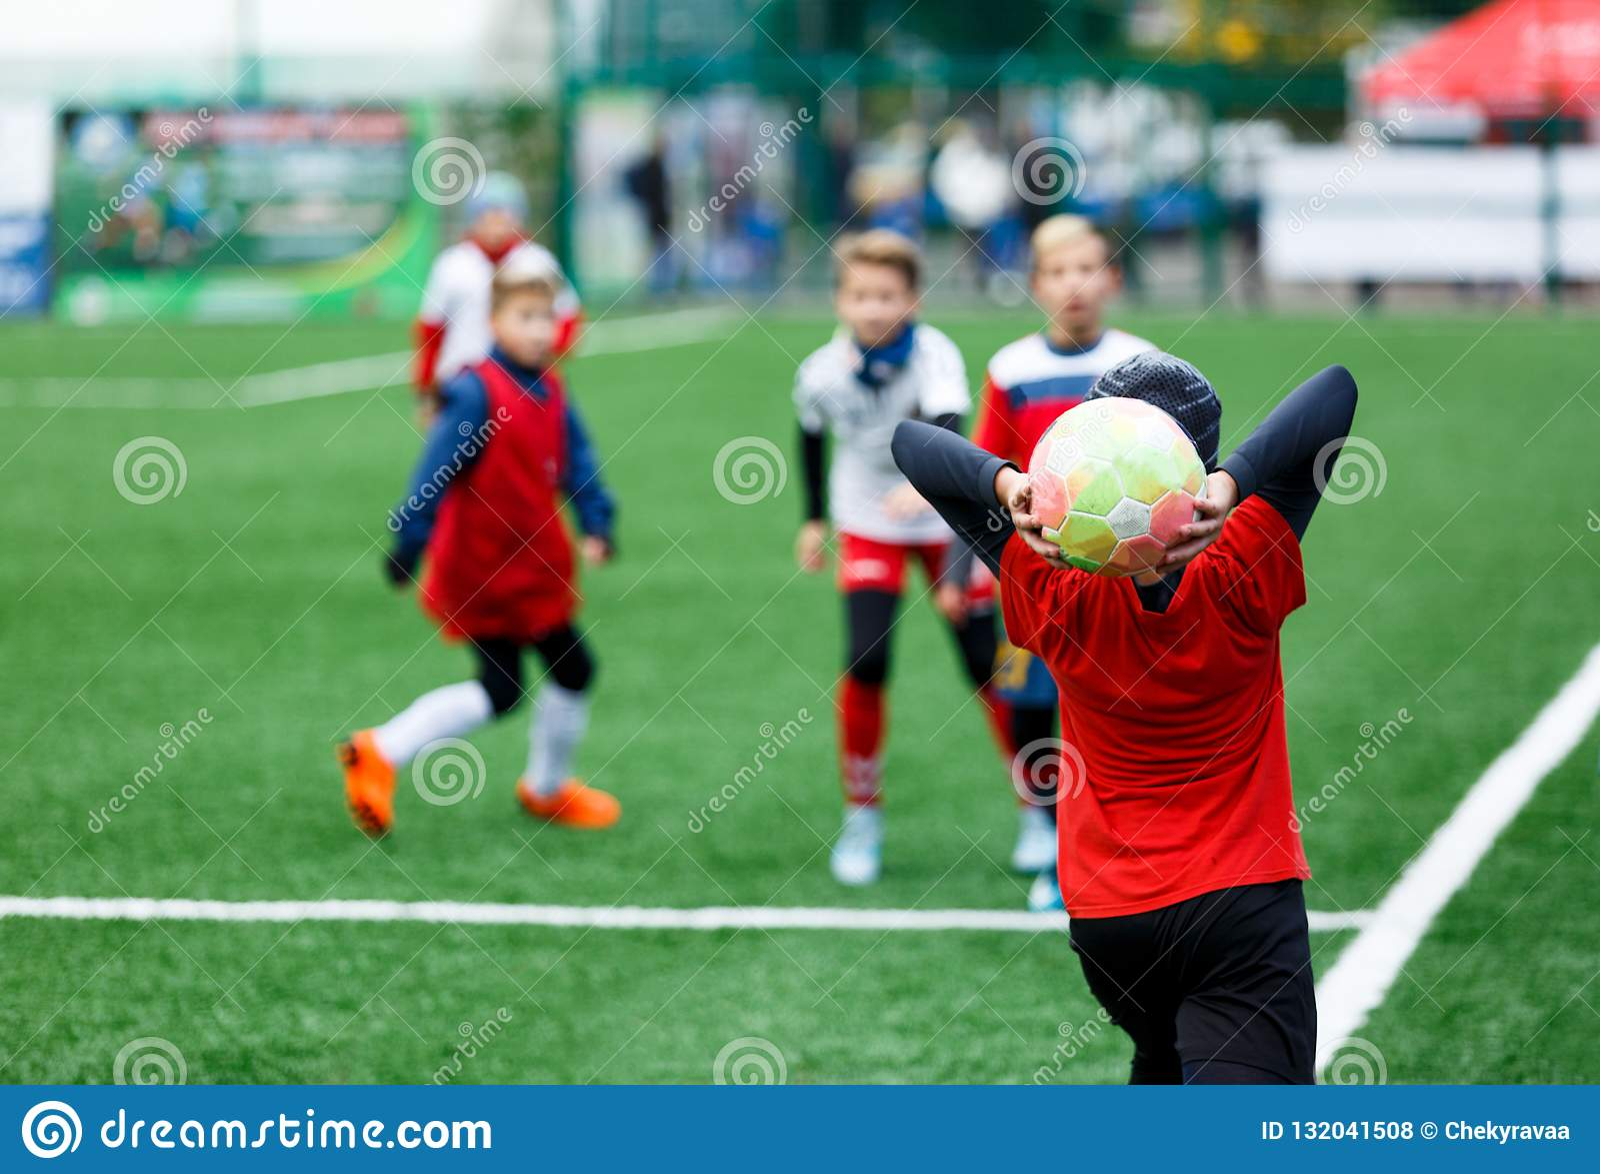 Football teams - boys in red, blue, white uniform play soccer on the green field. boys dribbling. dribbling skills.